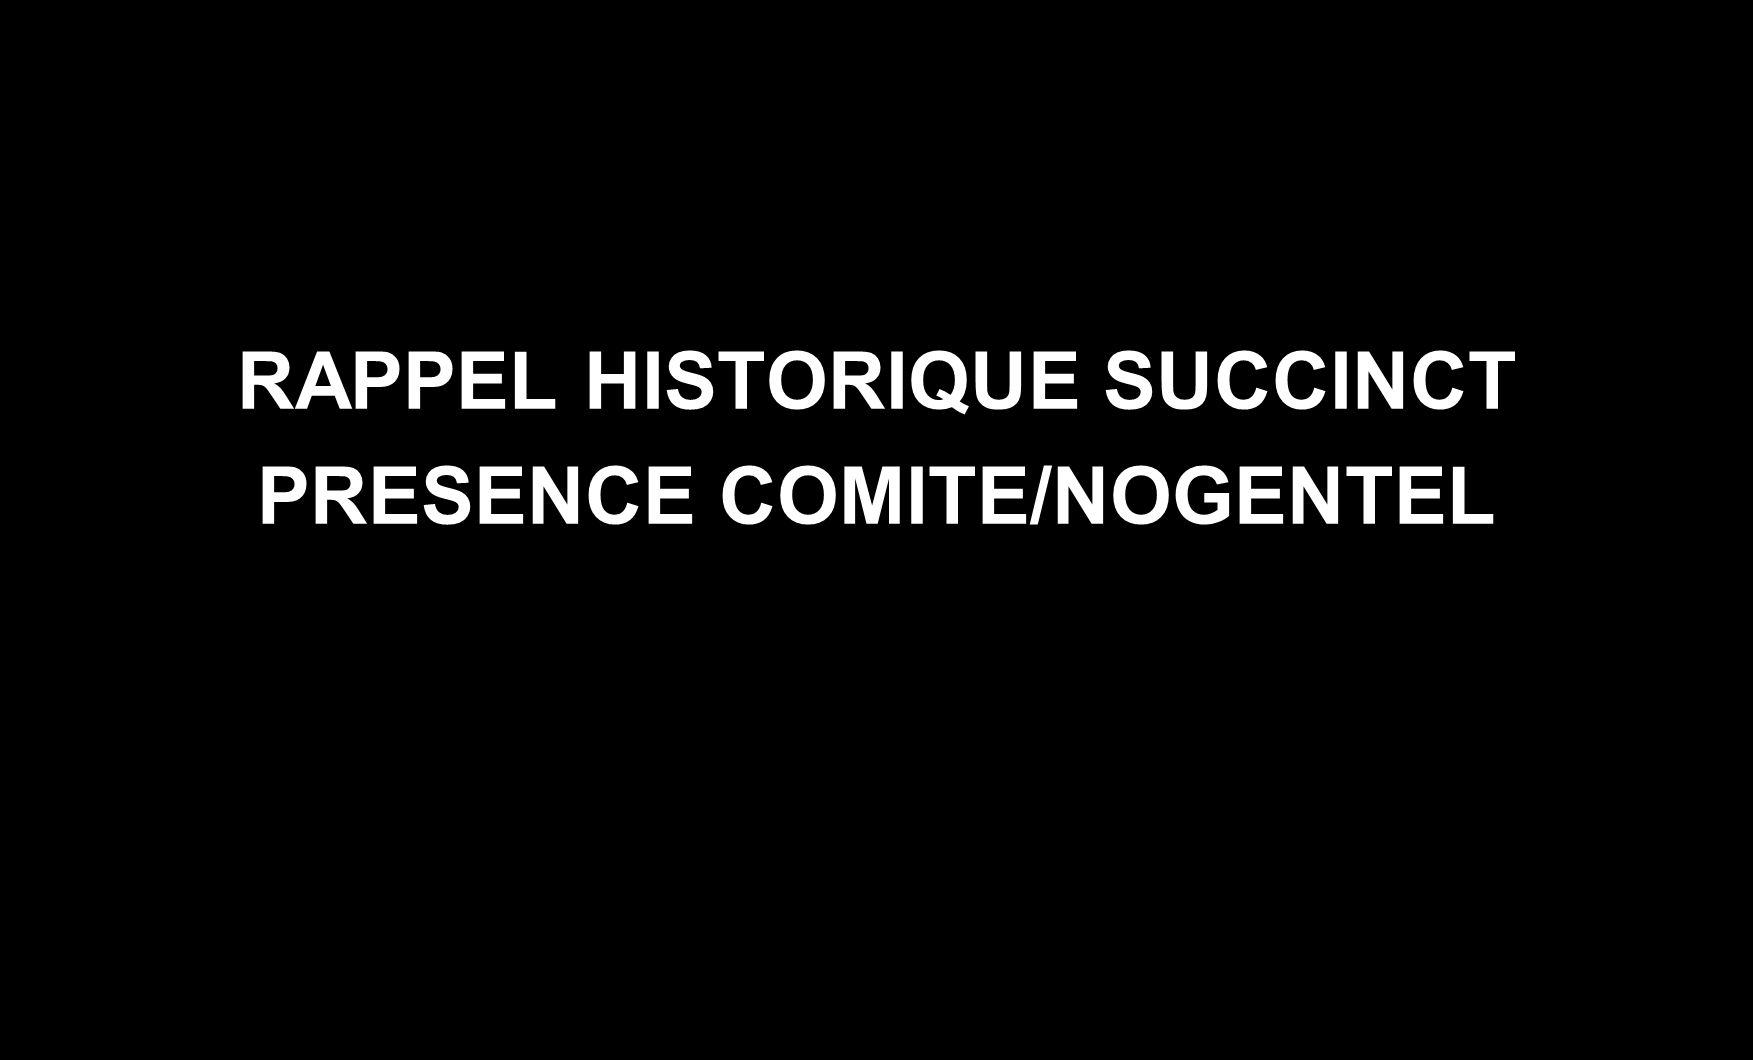 RAPPEL HISTORIQUE SUCCINCT PRESENCE COMITE/NOGENTEL